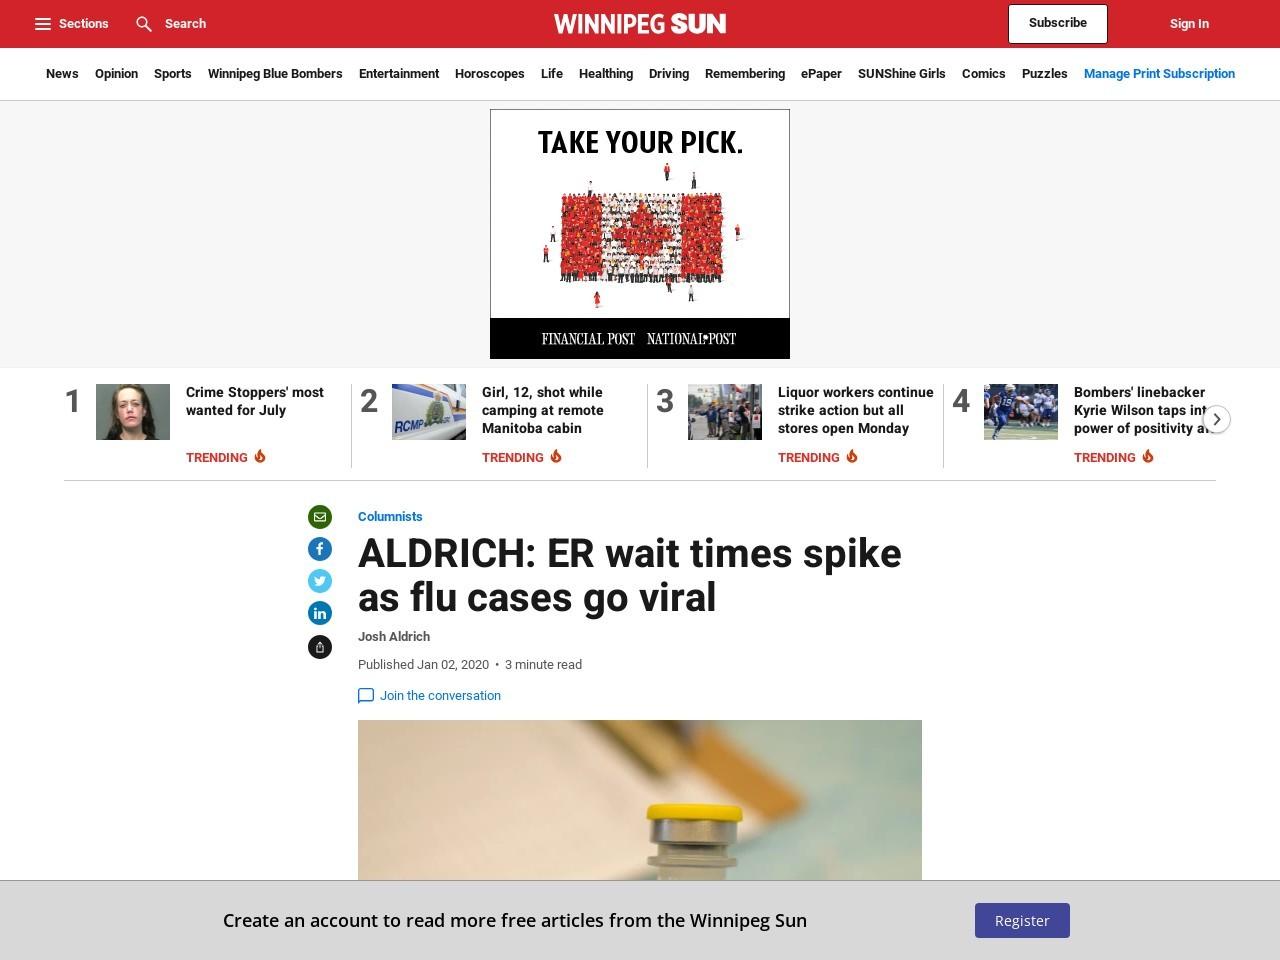 ALDRICH: ER wait times spike as flu cases go viral